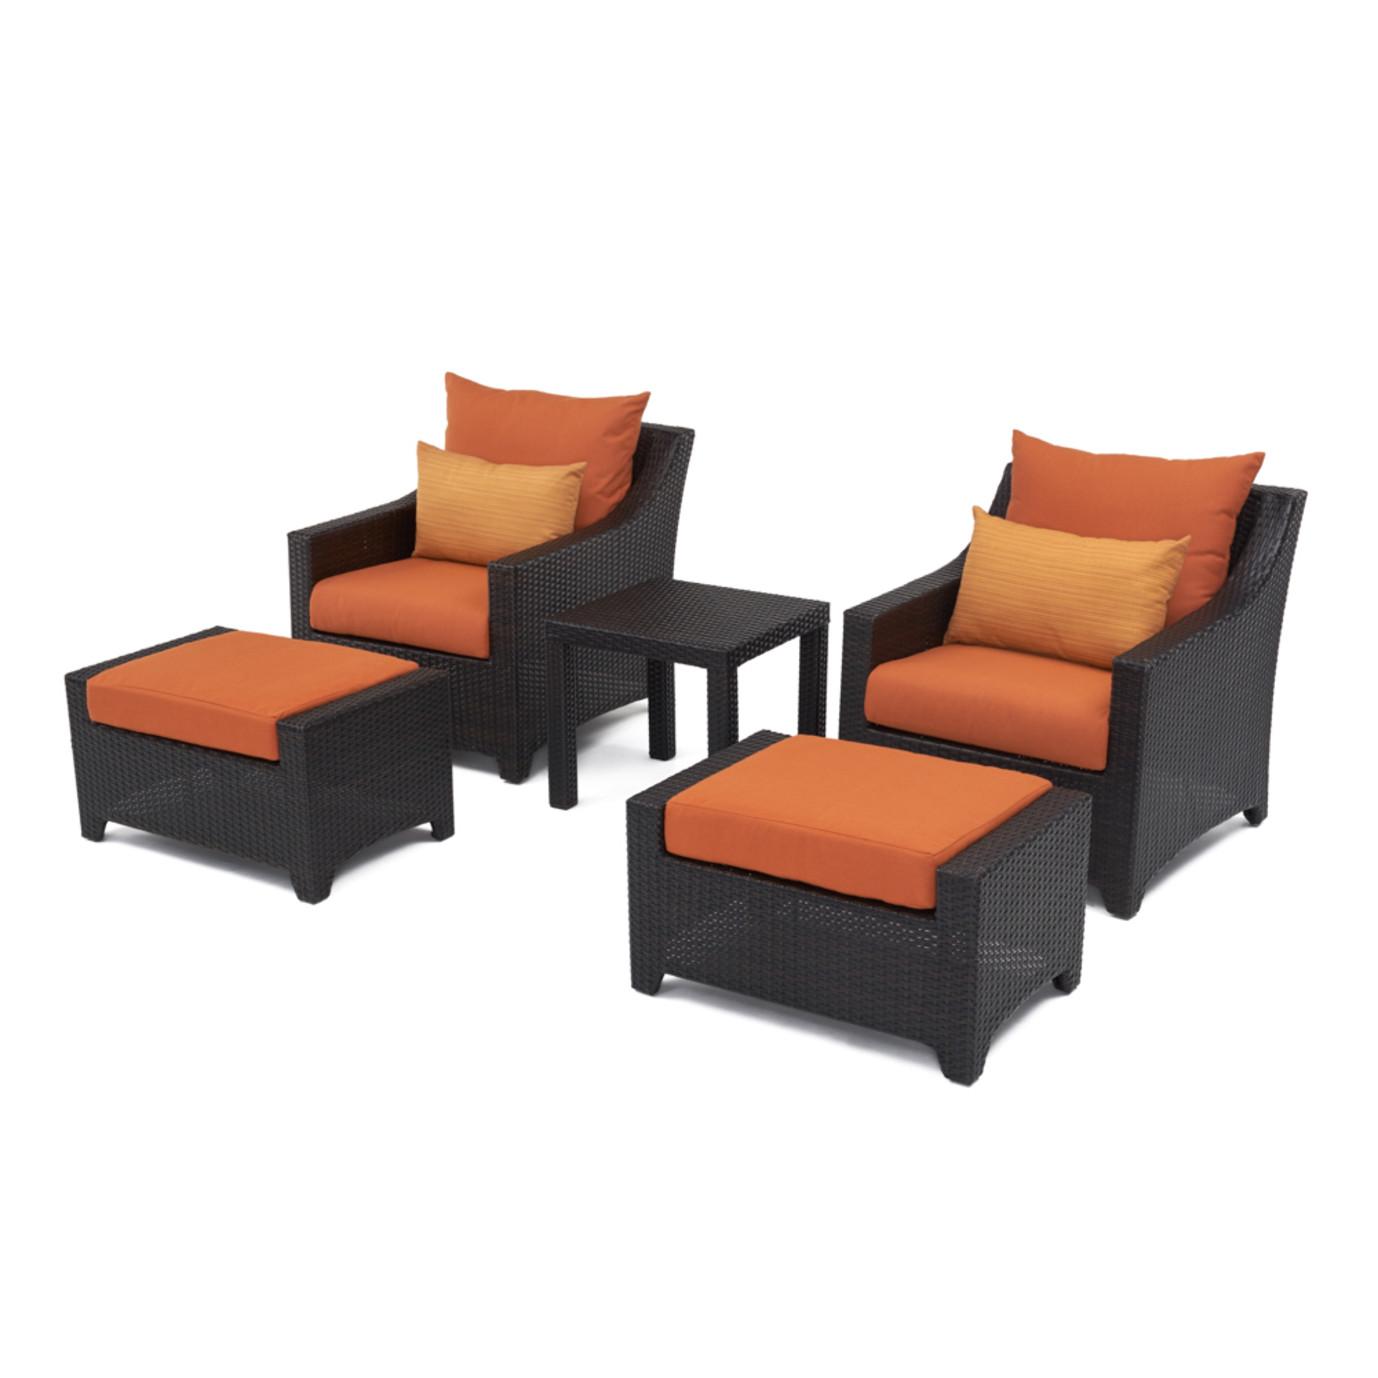 Deco™ 5pc Club Chair and Ottoman Set - Tikka Orange